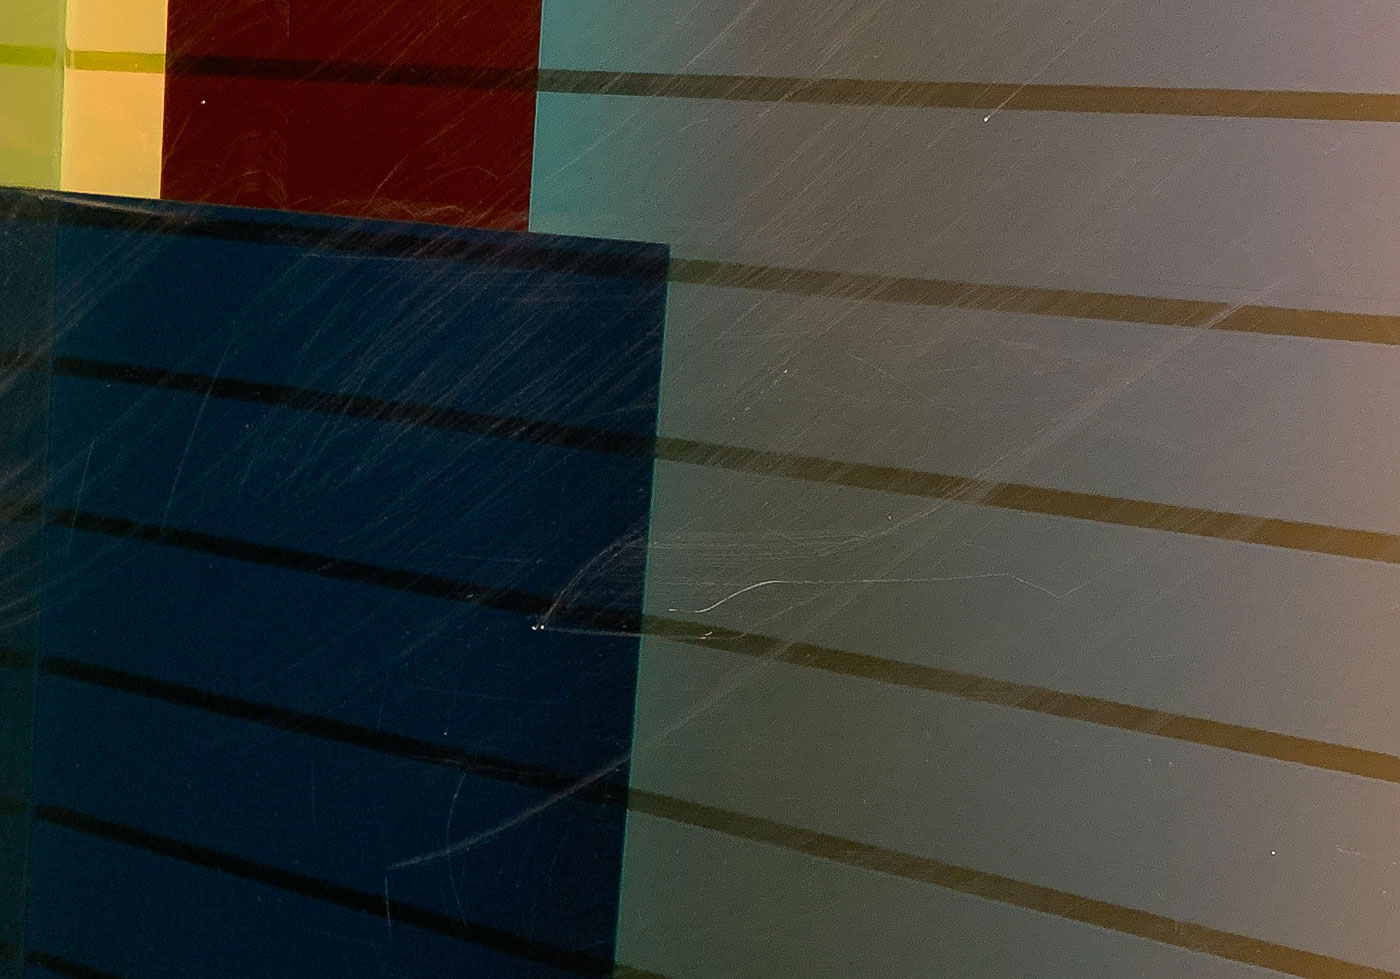 LARGE VASA MIHICH COLUMN - Image 6 of 7